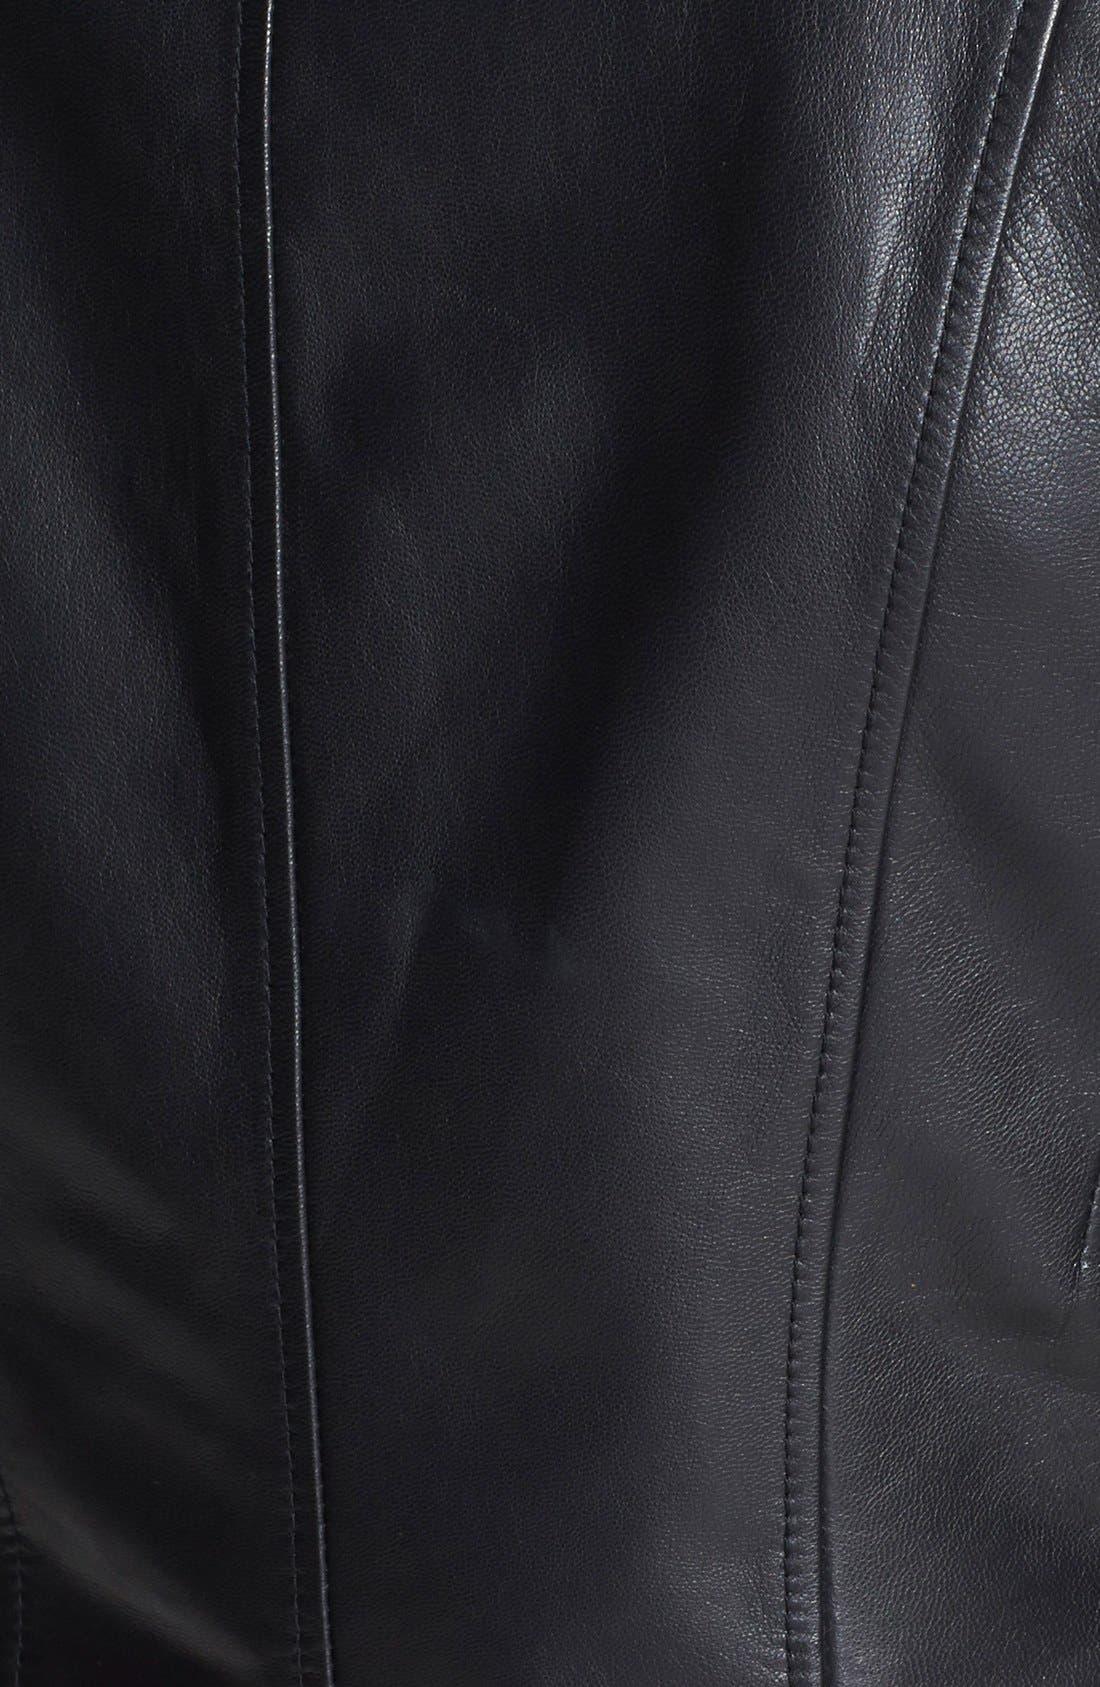 'KitKat' Faux Shearling Trim Leather Jacket,                             Alternate thumbnail 2, color,                             001